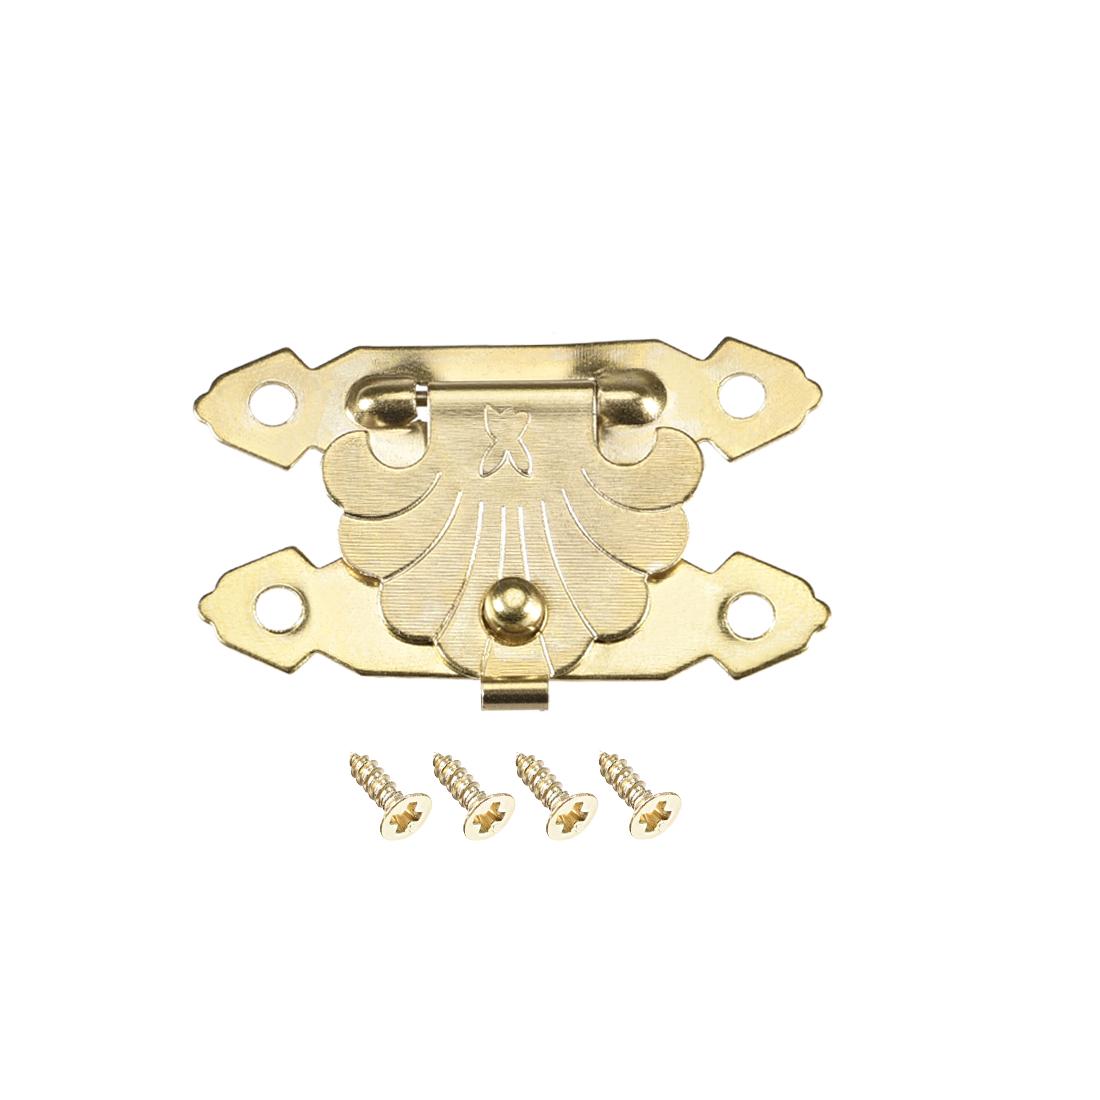 Wood Case Box Rectangle Hasp 38x23mm Zinc Alloy Antique Latches Yellow, 20 Pcs